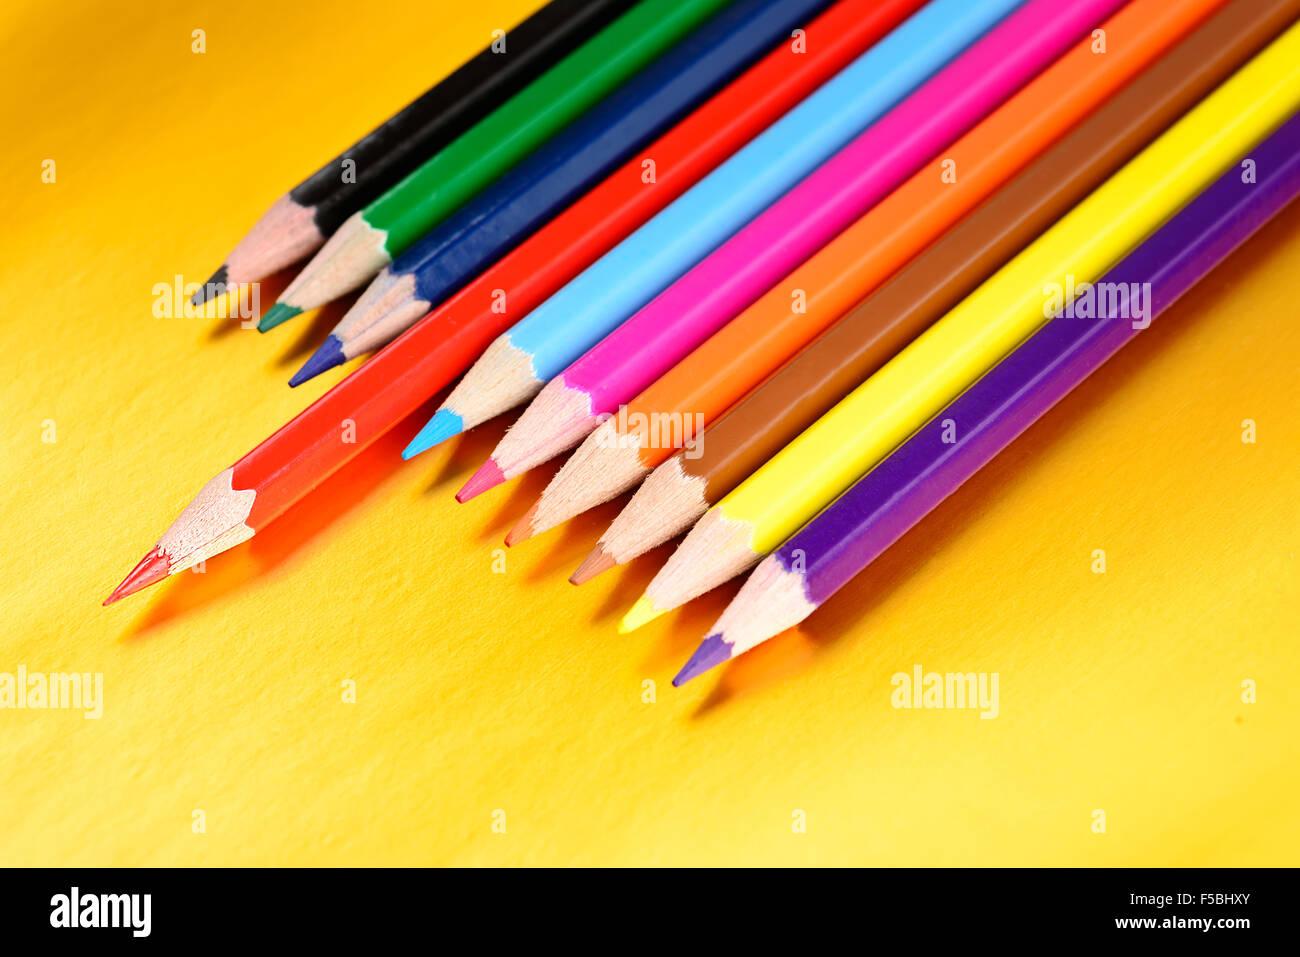 Lápices de color con diferentes colores sobre fondo dorado Imagen De Stock